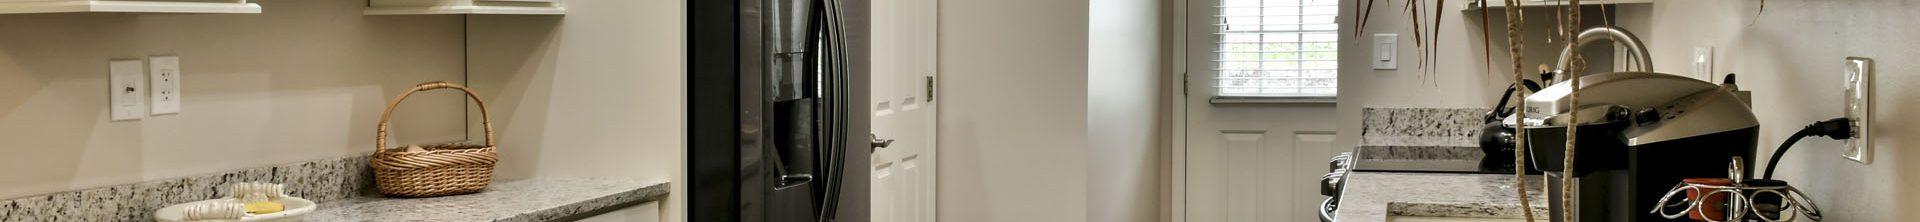 Louisville Interior Designer, Louisville Renovation Designer, Whole Home Renovation, White Kitchen Cabinets, Hardwood Flooring, Black Appliances, Light and Air, Kitchen Lighting, Granite Countertops, Bath Renovation